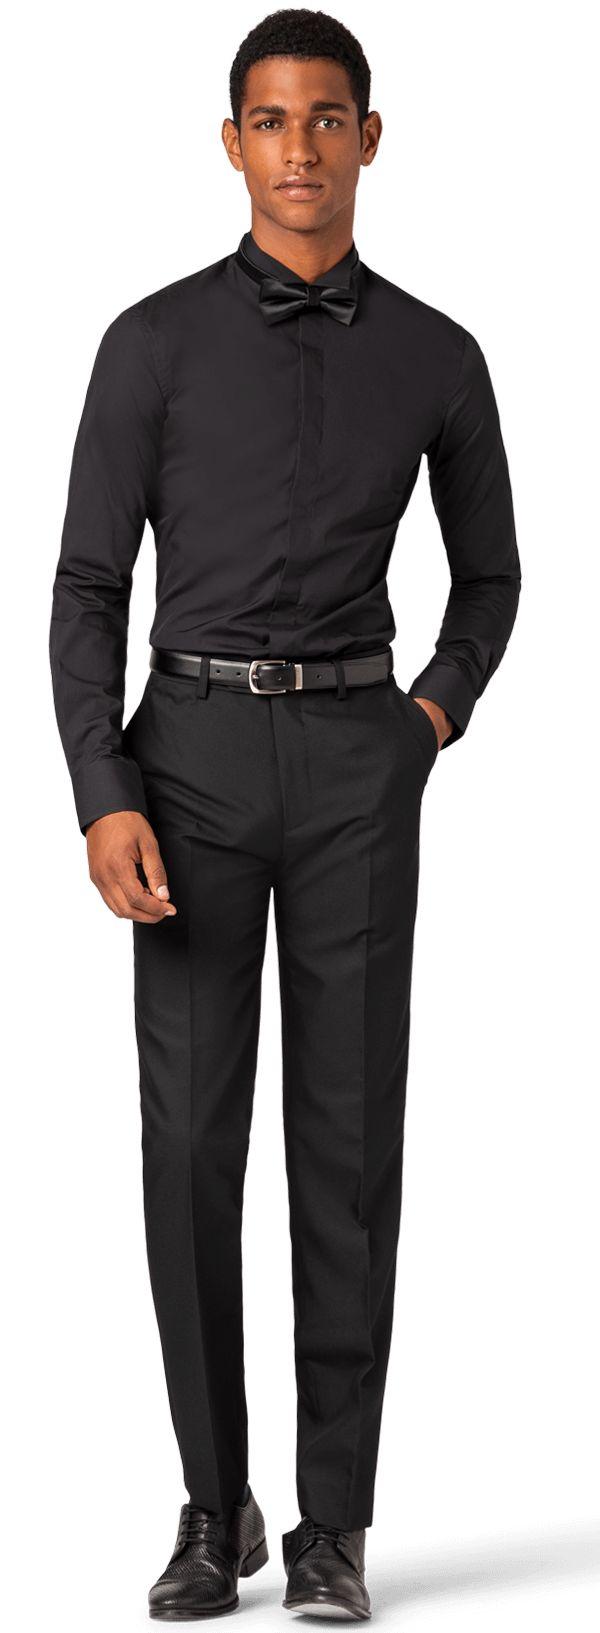 Black tuxedo shirt